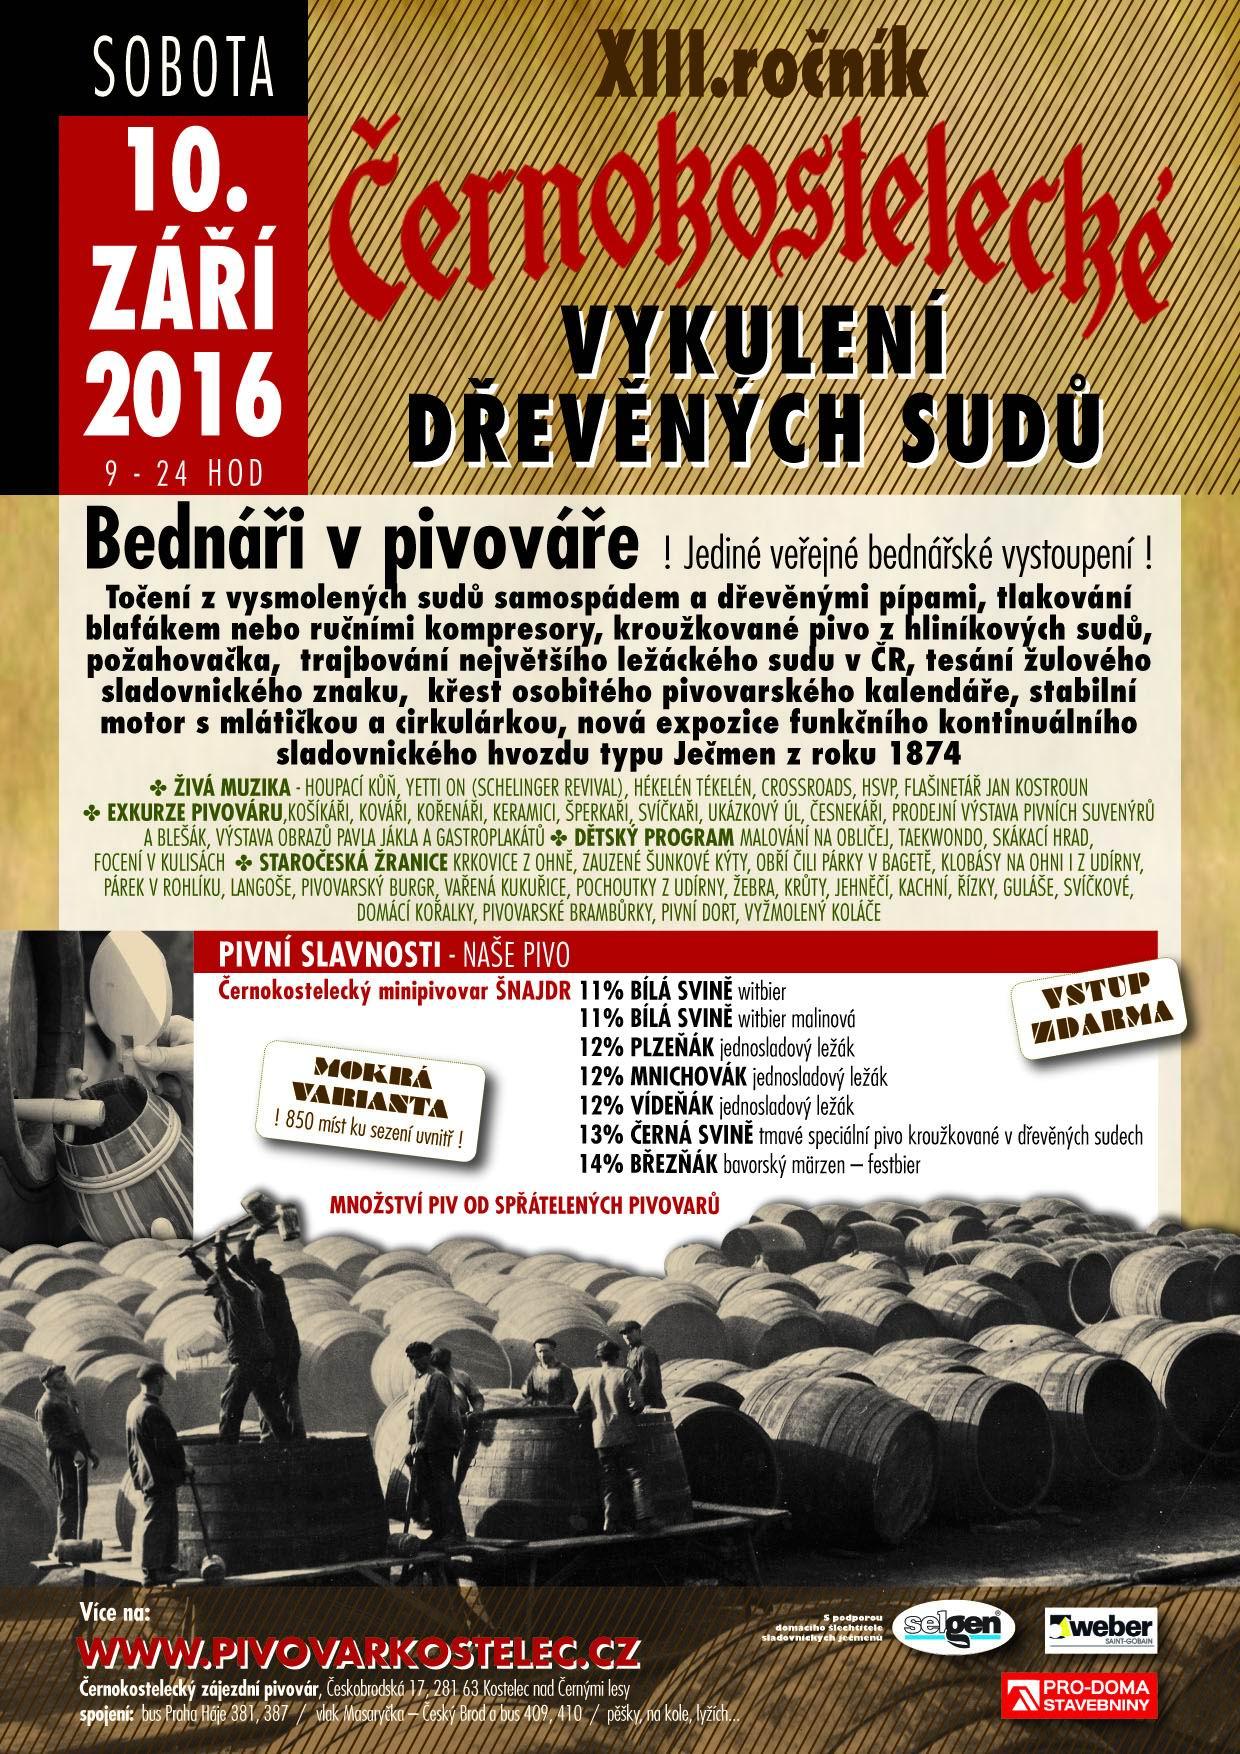 PBA_vykuleni_2016_8_4